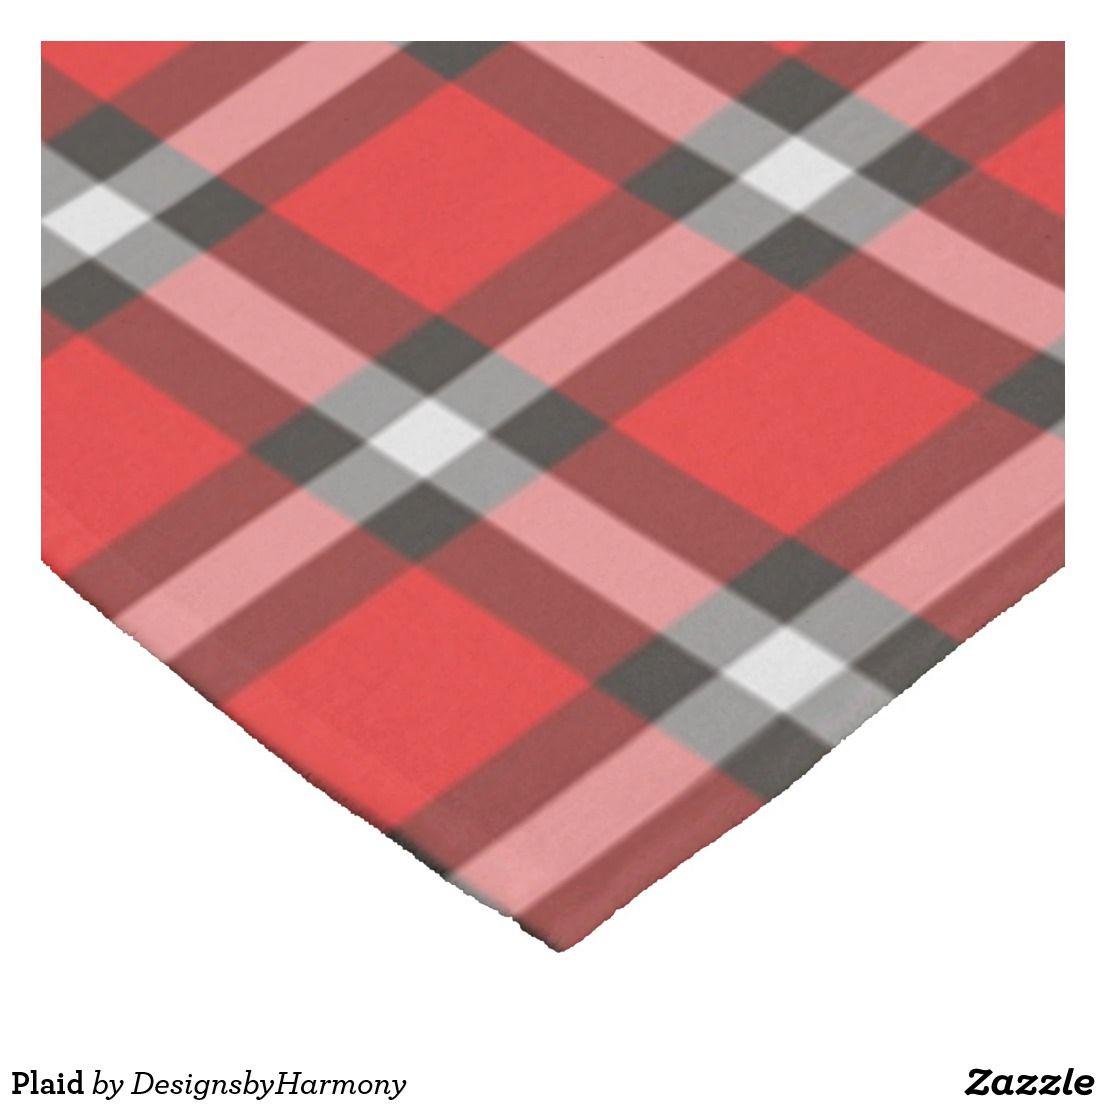 Plaid fleece blanket plaid fleece blankets and blankets